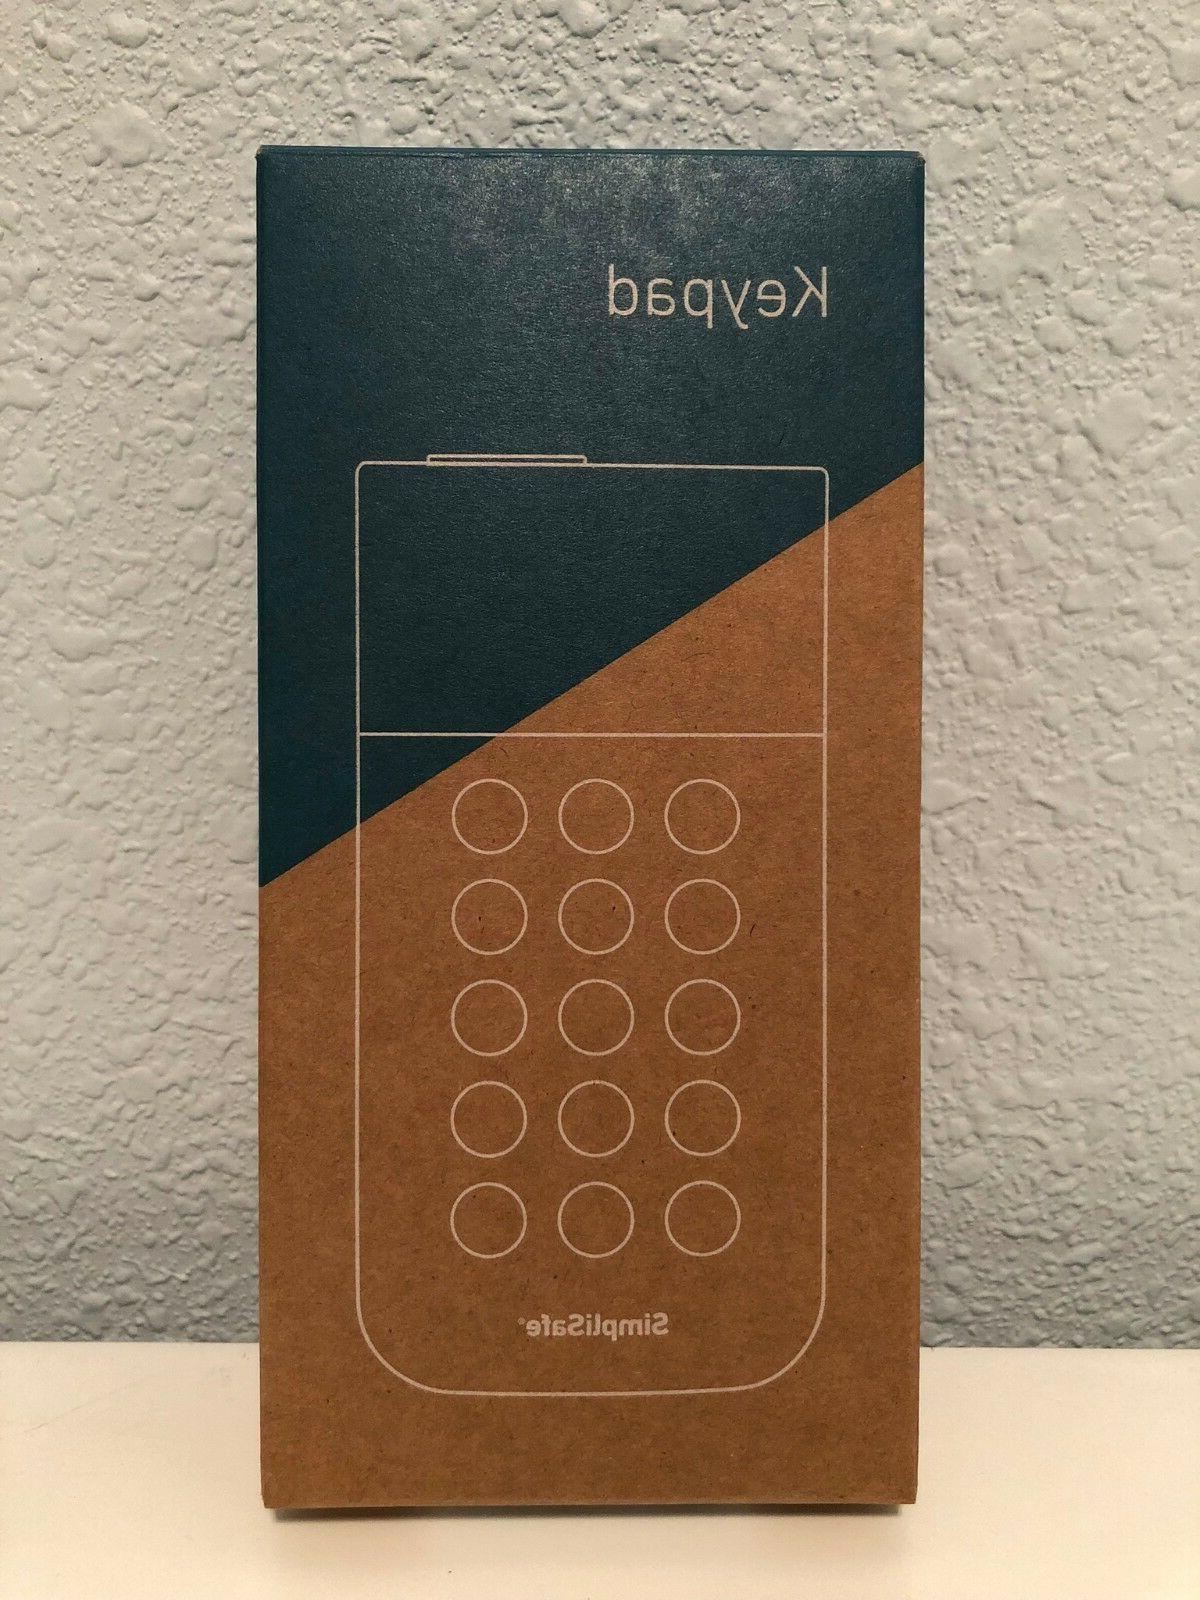 NEW Simplisafe Keypad New in